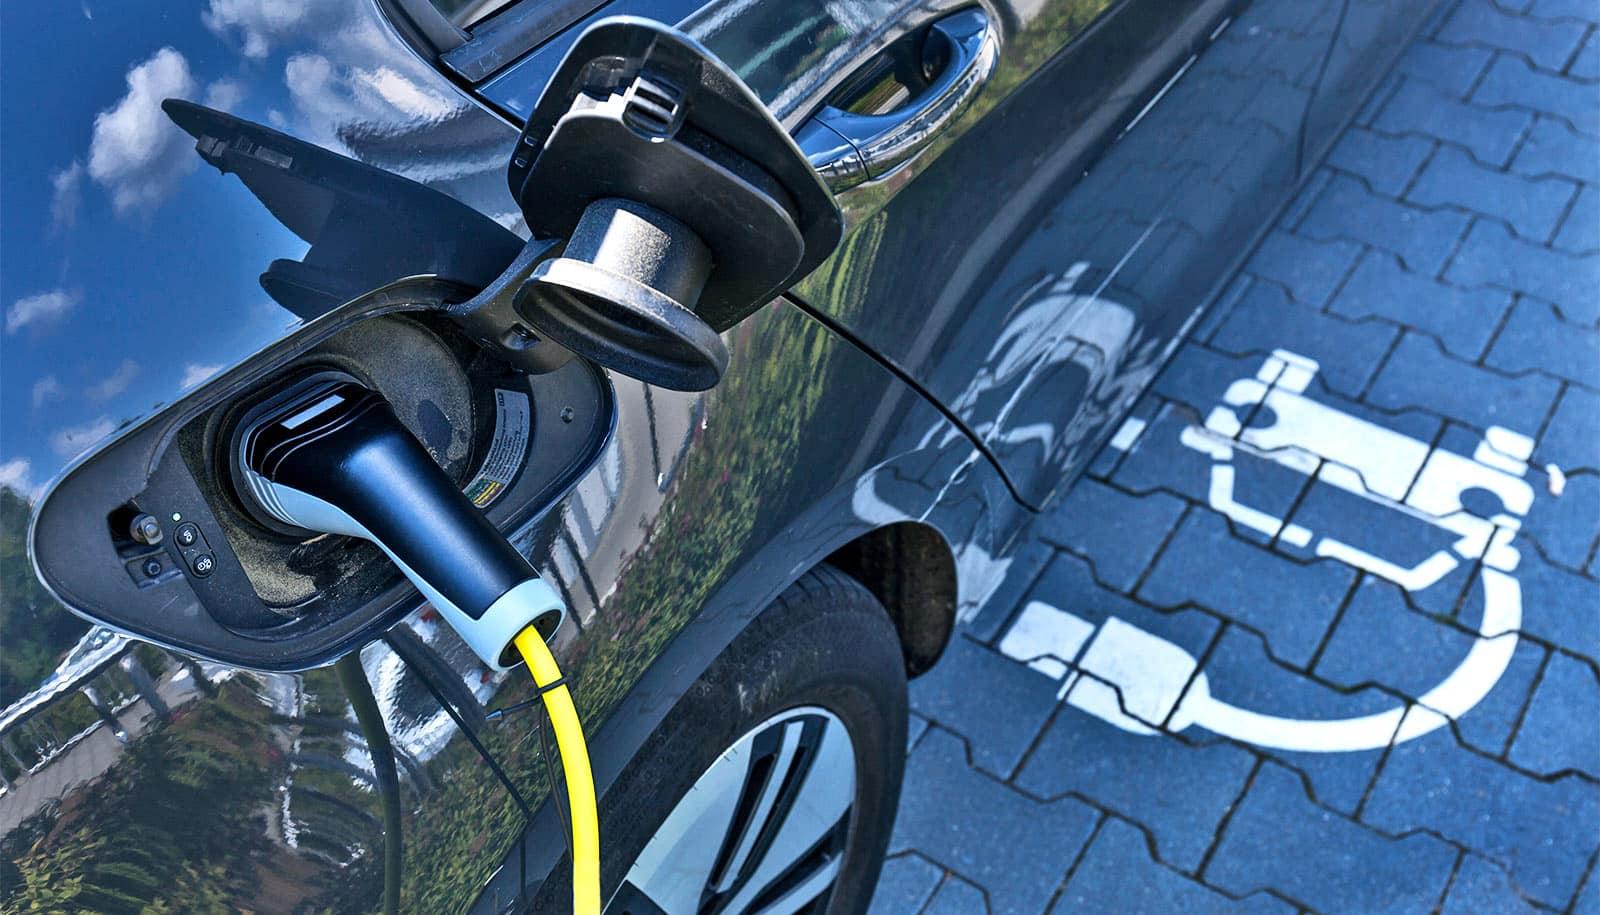 Coating makes lithium metal batteries last and last - Futurity